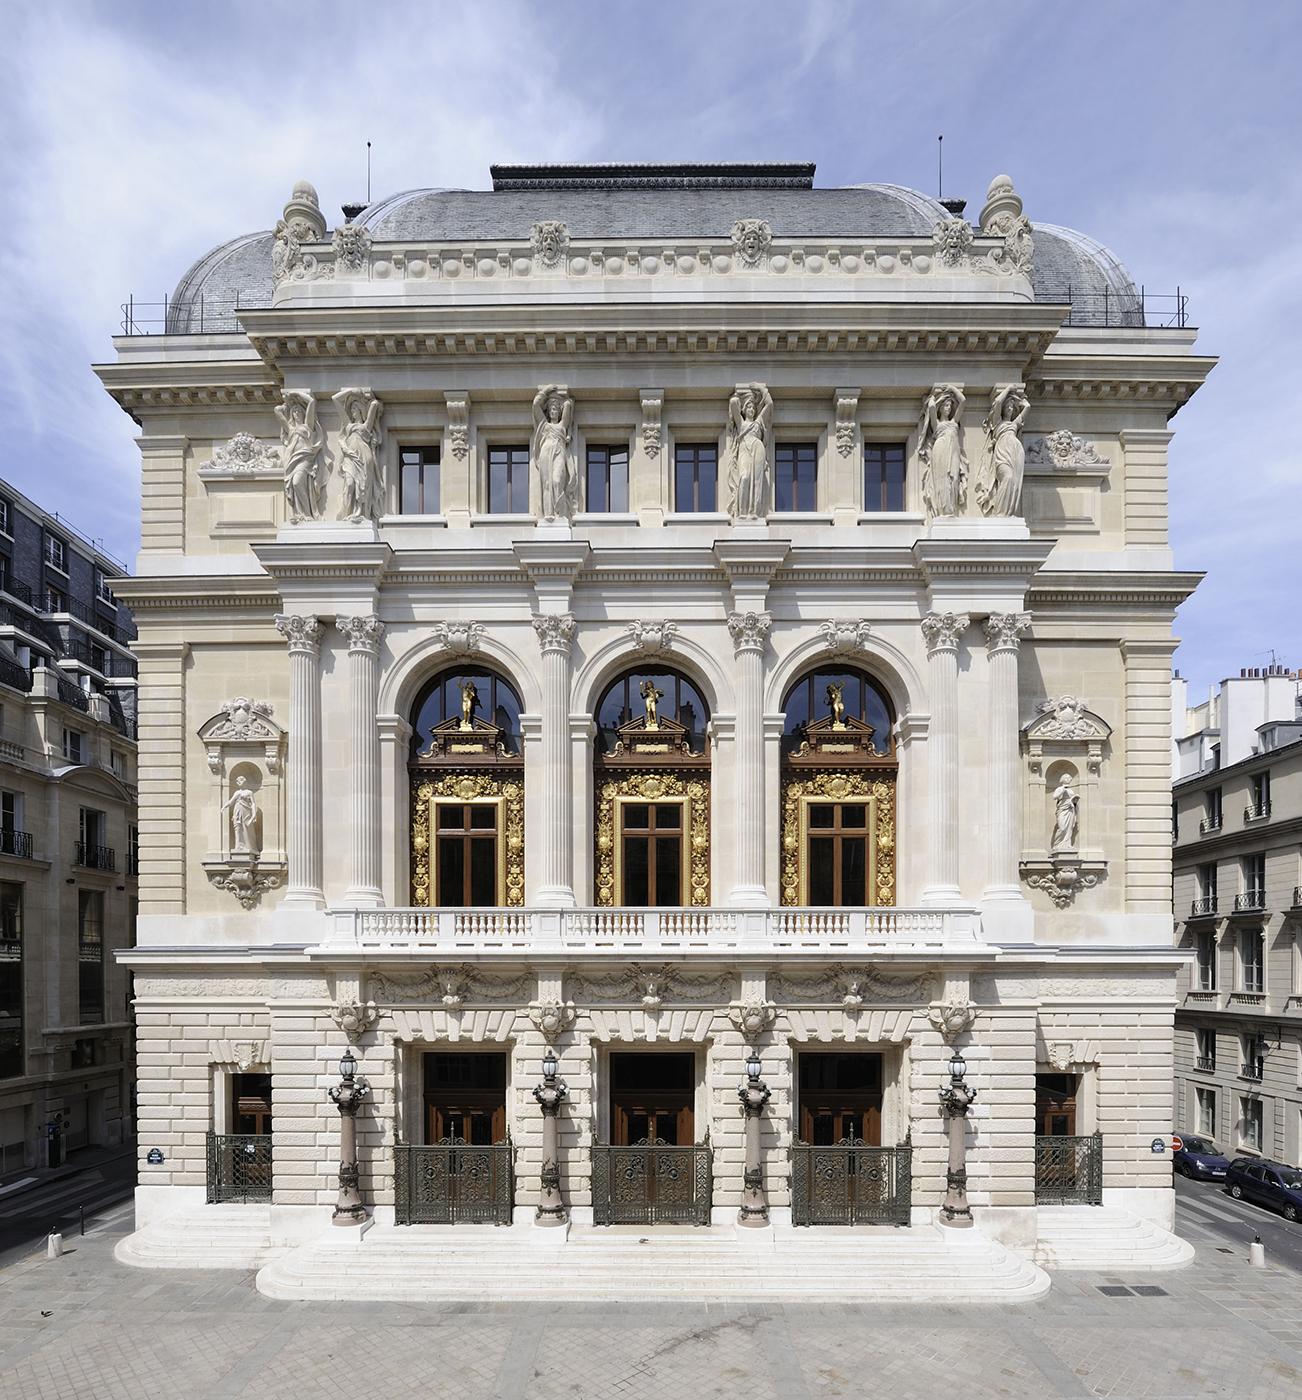 Facade De LOpera Comique C RMN Rene Gabriel Ojeda Opera